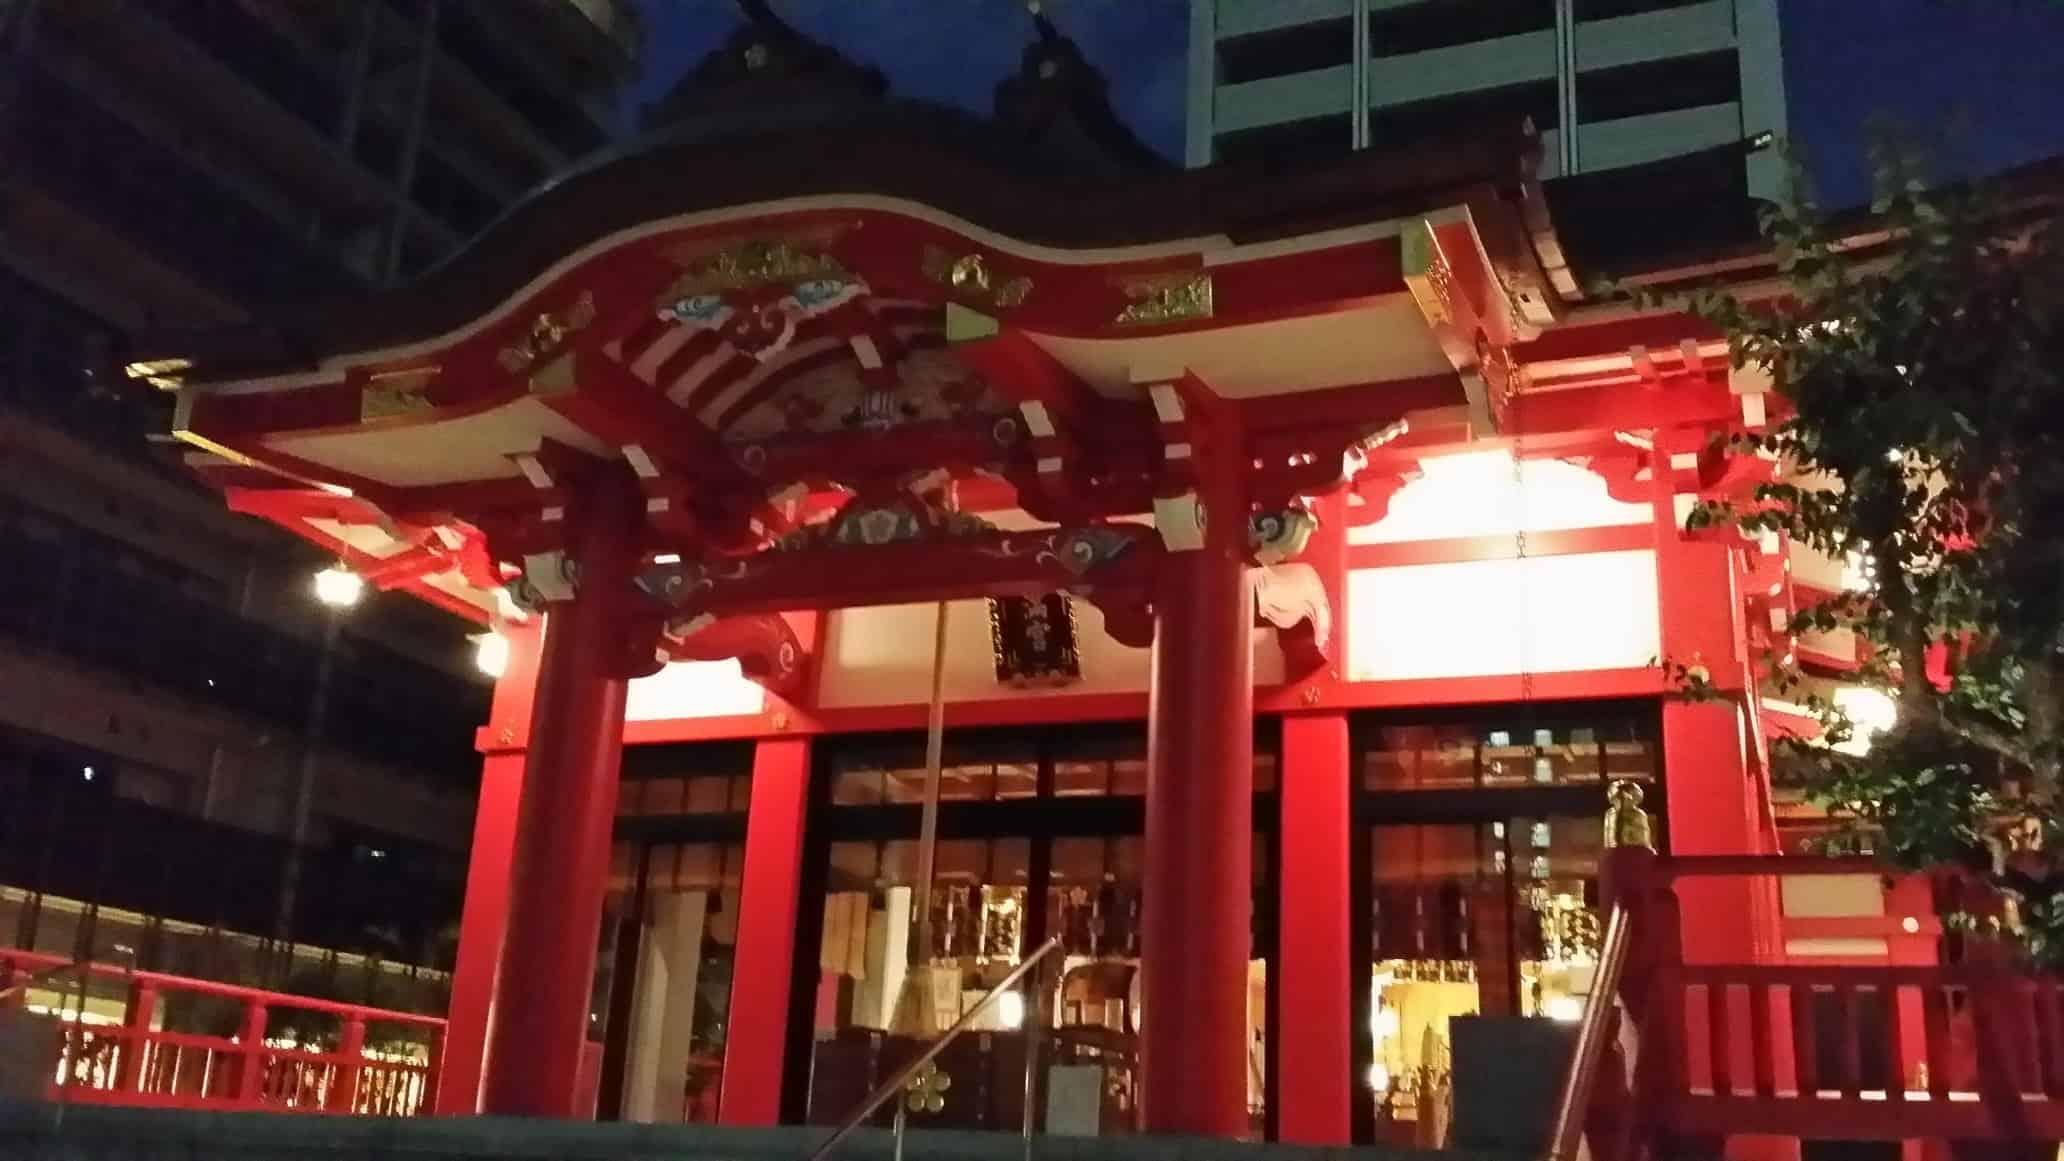 Shrine at night in Tokyo